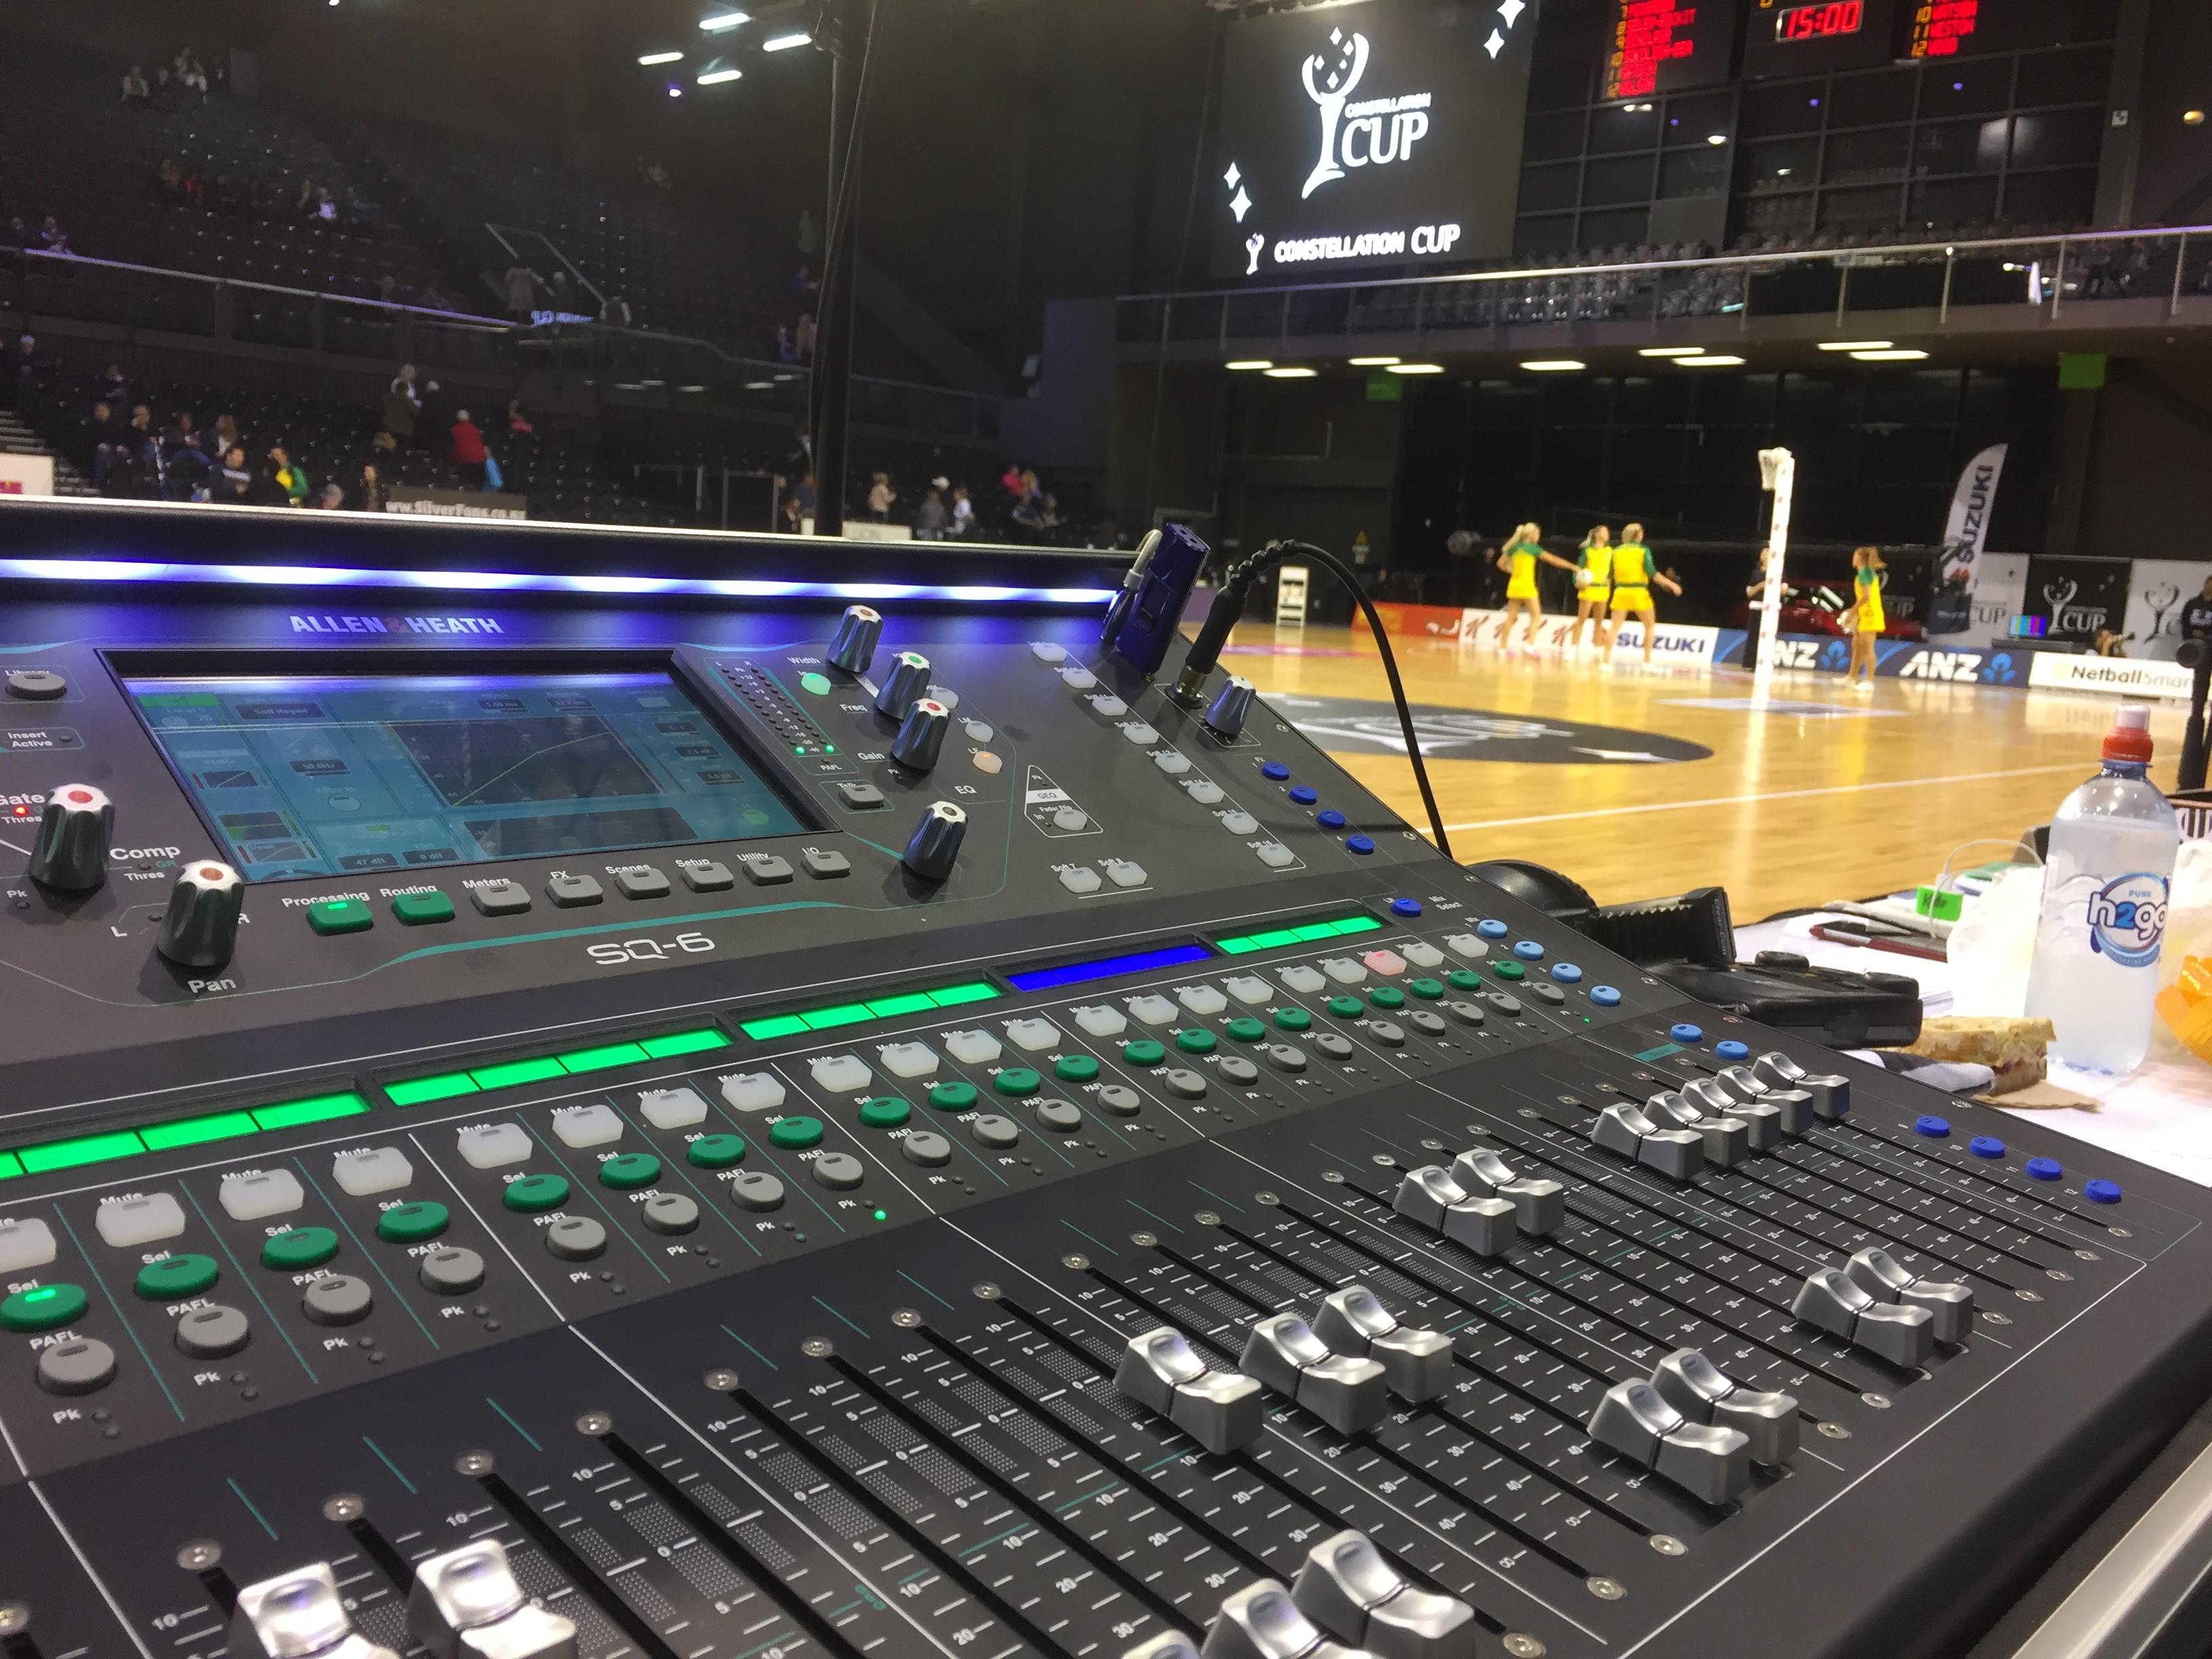 Audio Workshop provides Sound for the NZ Vs Australia Netball Test, Wellington.